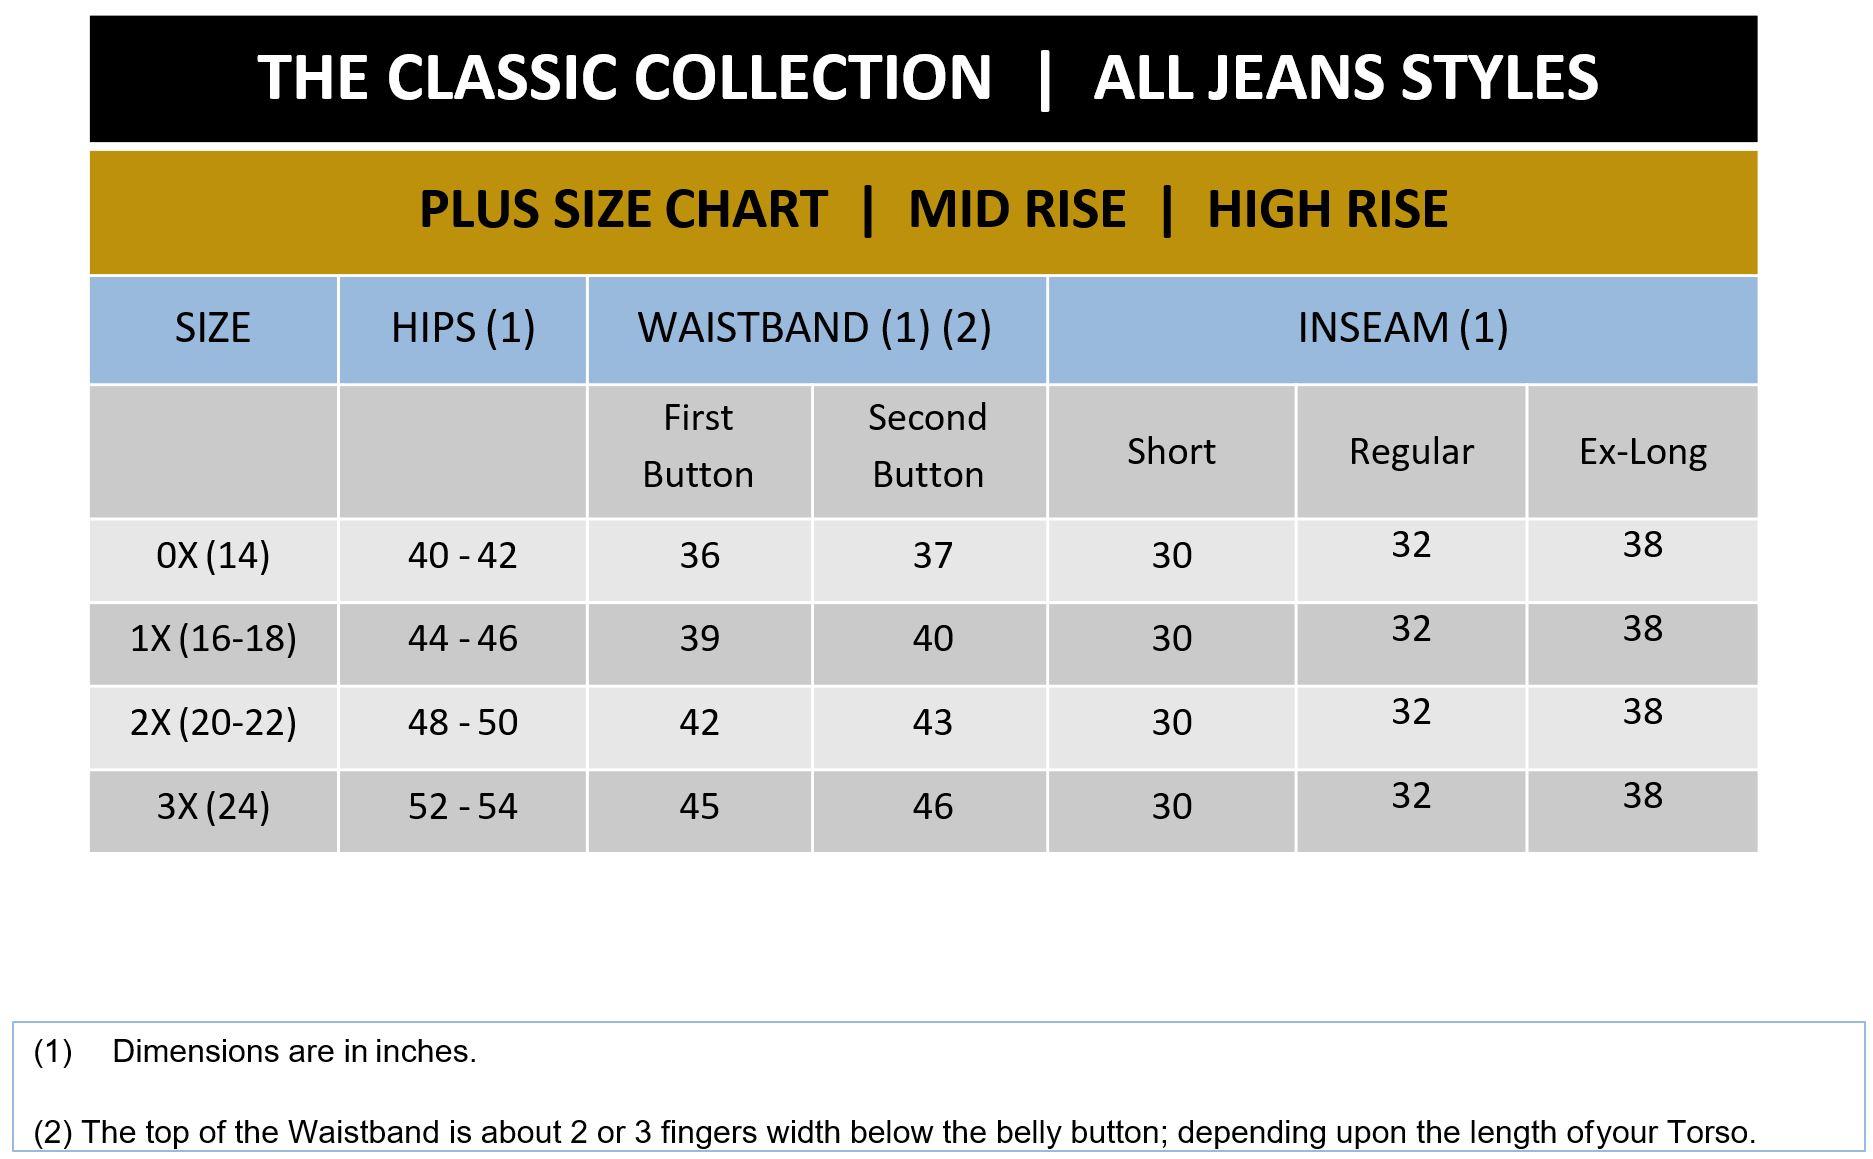 ebay.bu-denim.plus-size-chart.1feb2020.jpg